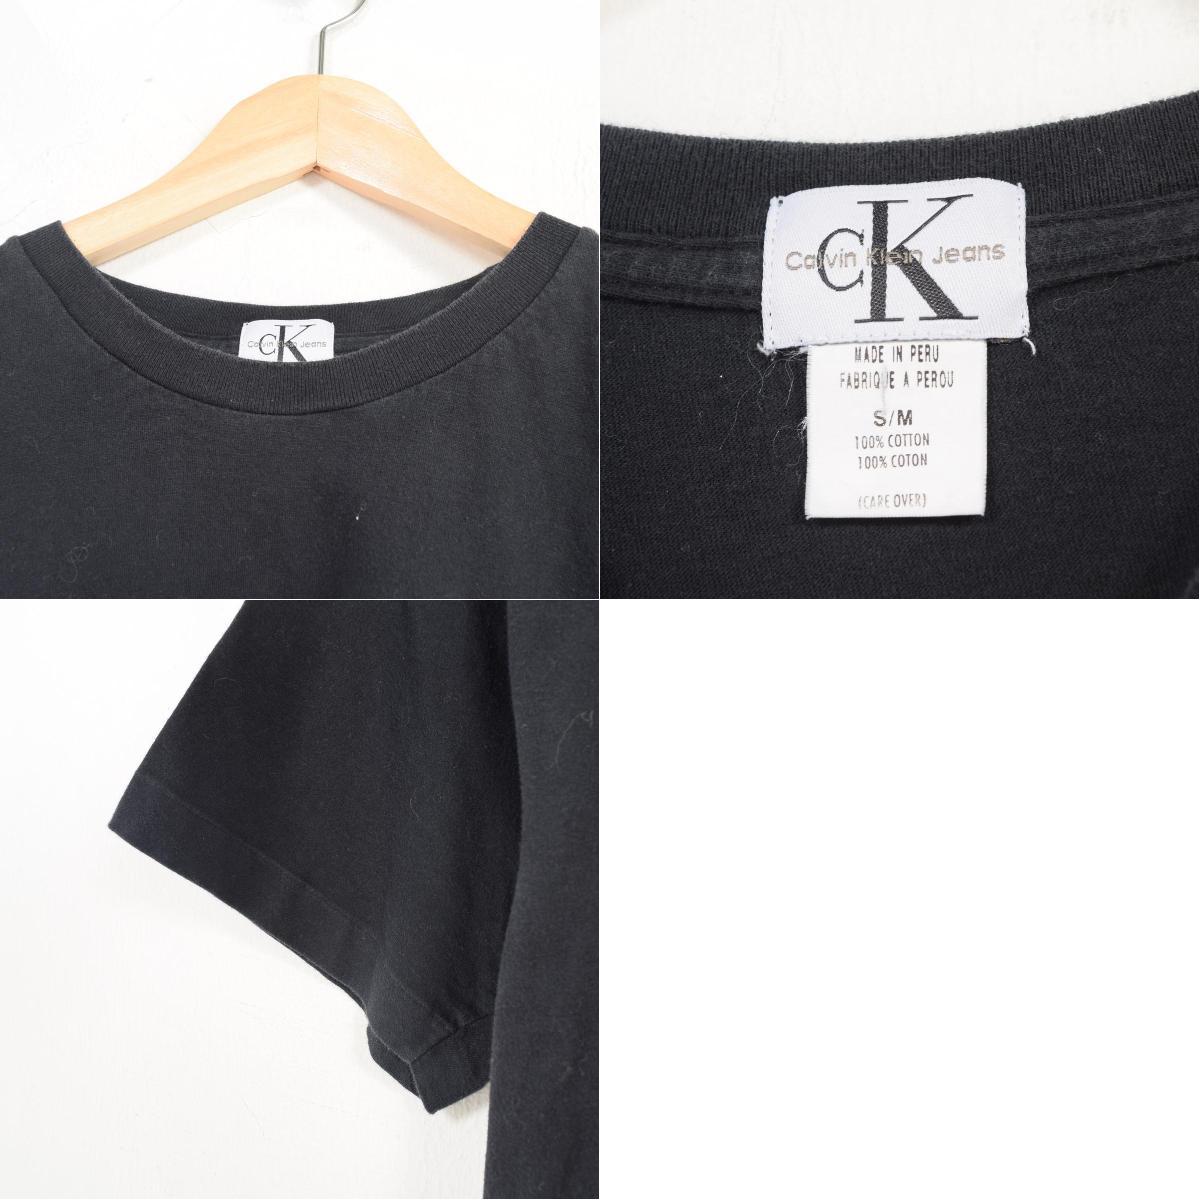 a2c9d9c16 ... 90s Calvin Klein Calvin klein JEANS logo print T-shirt men L /war0857